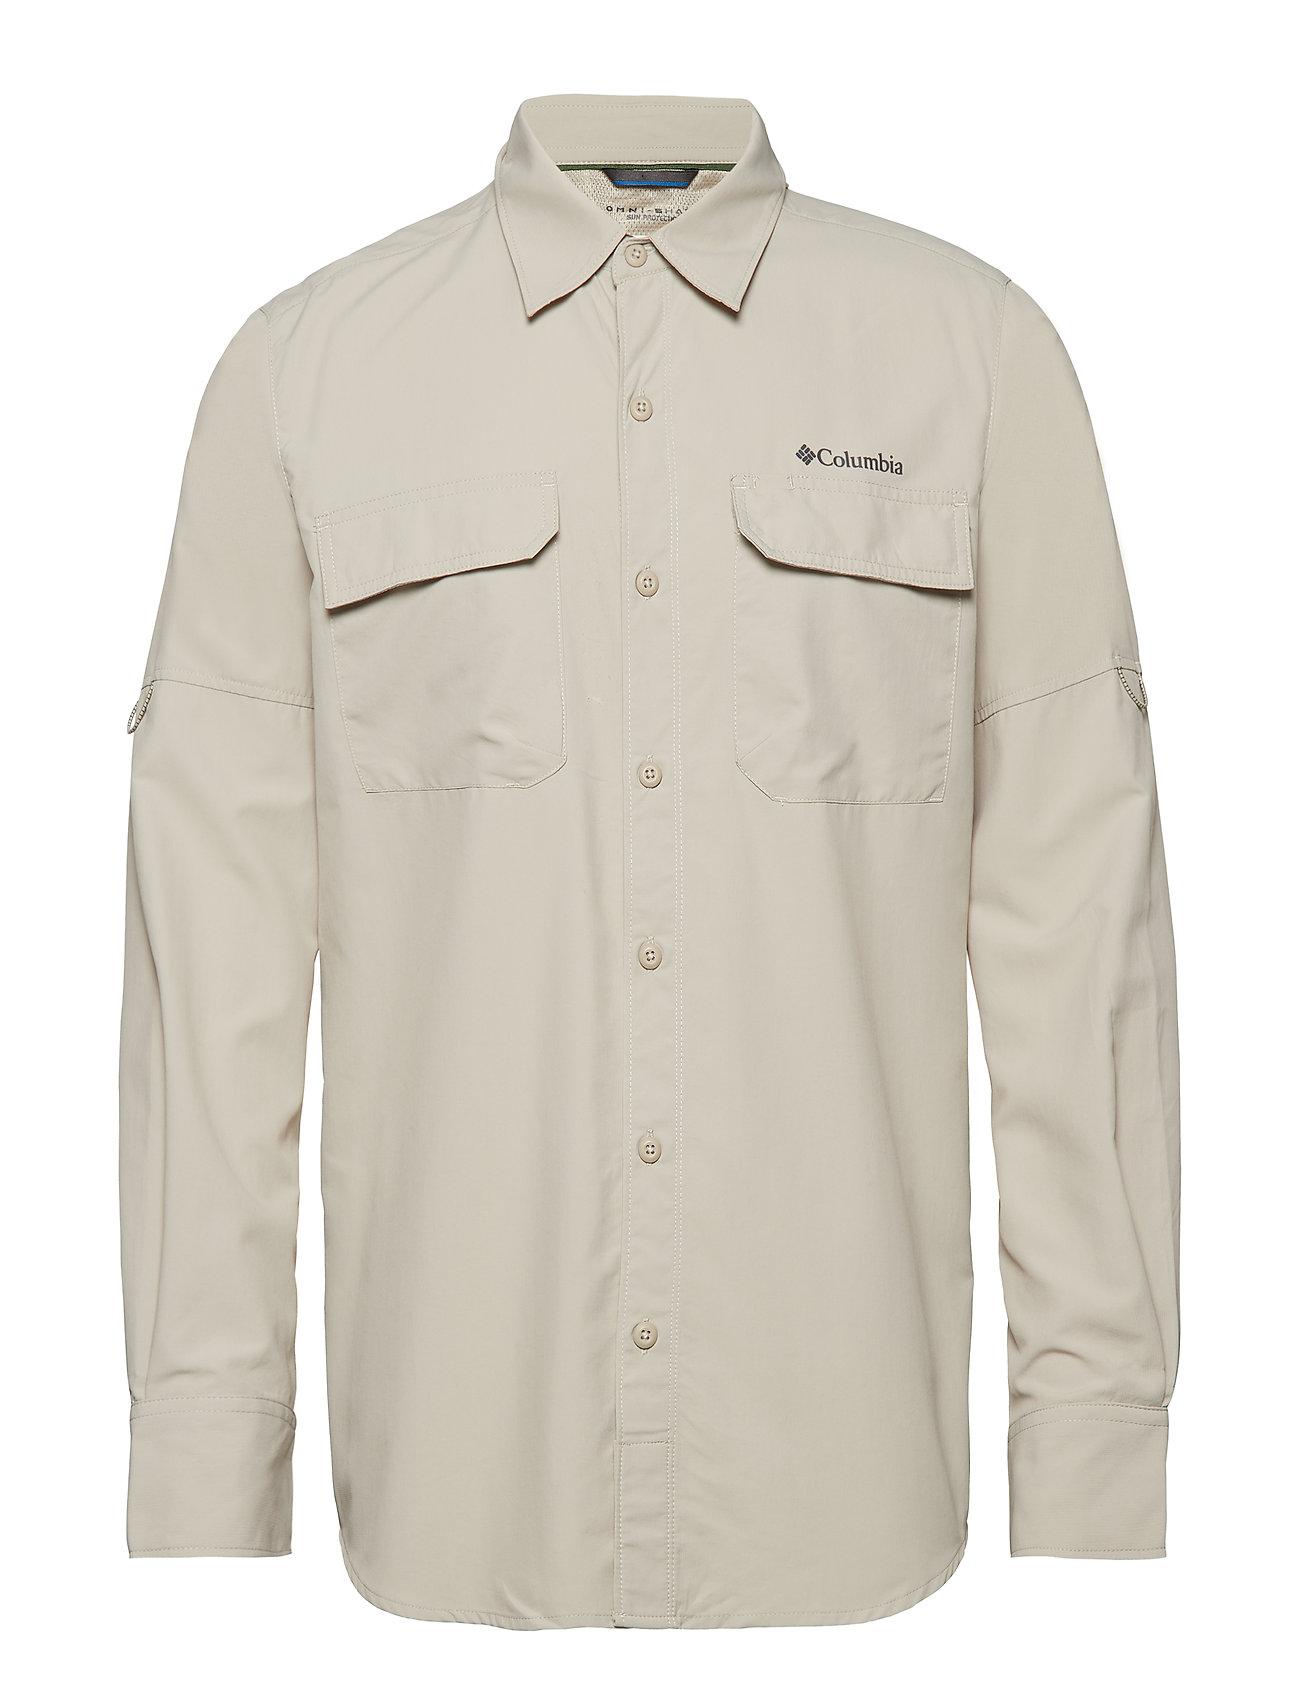 4b00e901c4c Silver Ridge™ Ii Long Sleeve Shirt (Fossil) (£32.50) - Columbia ...